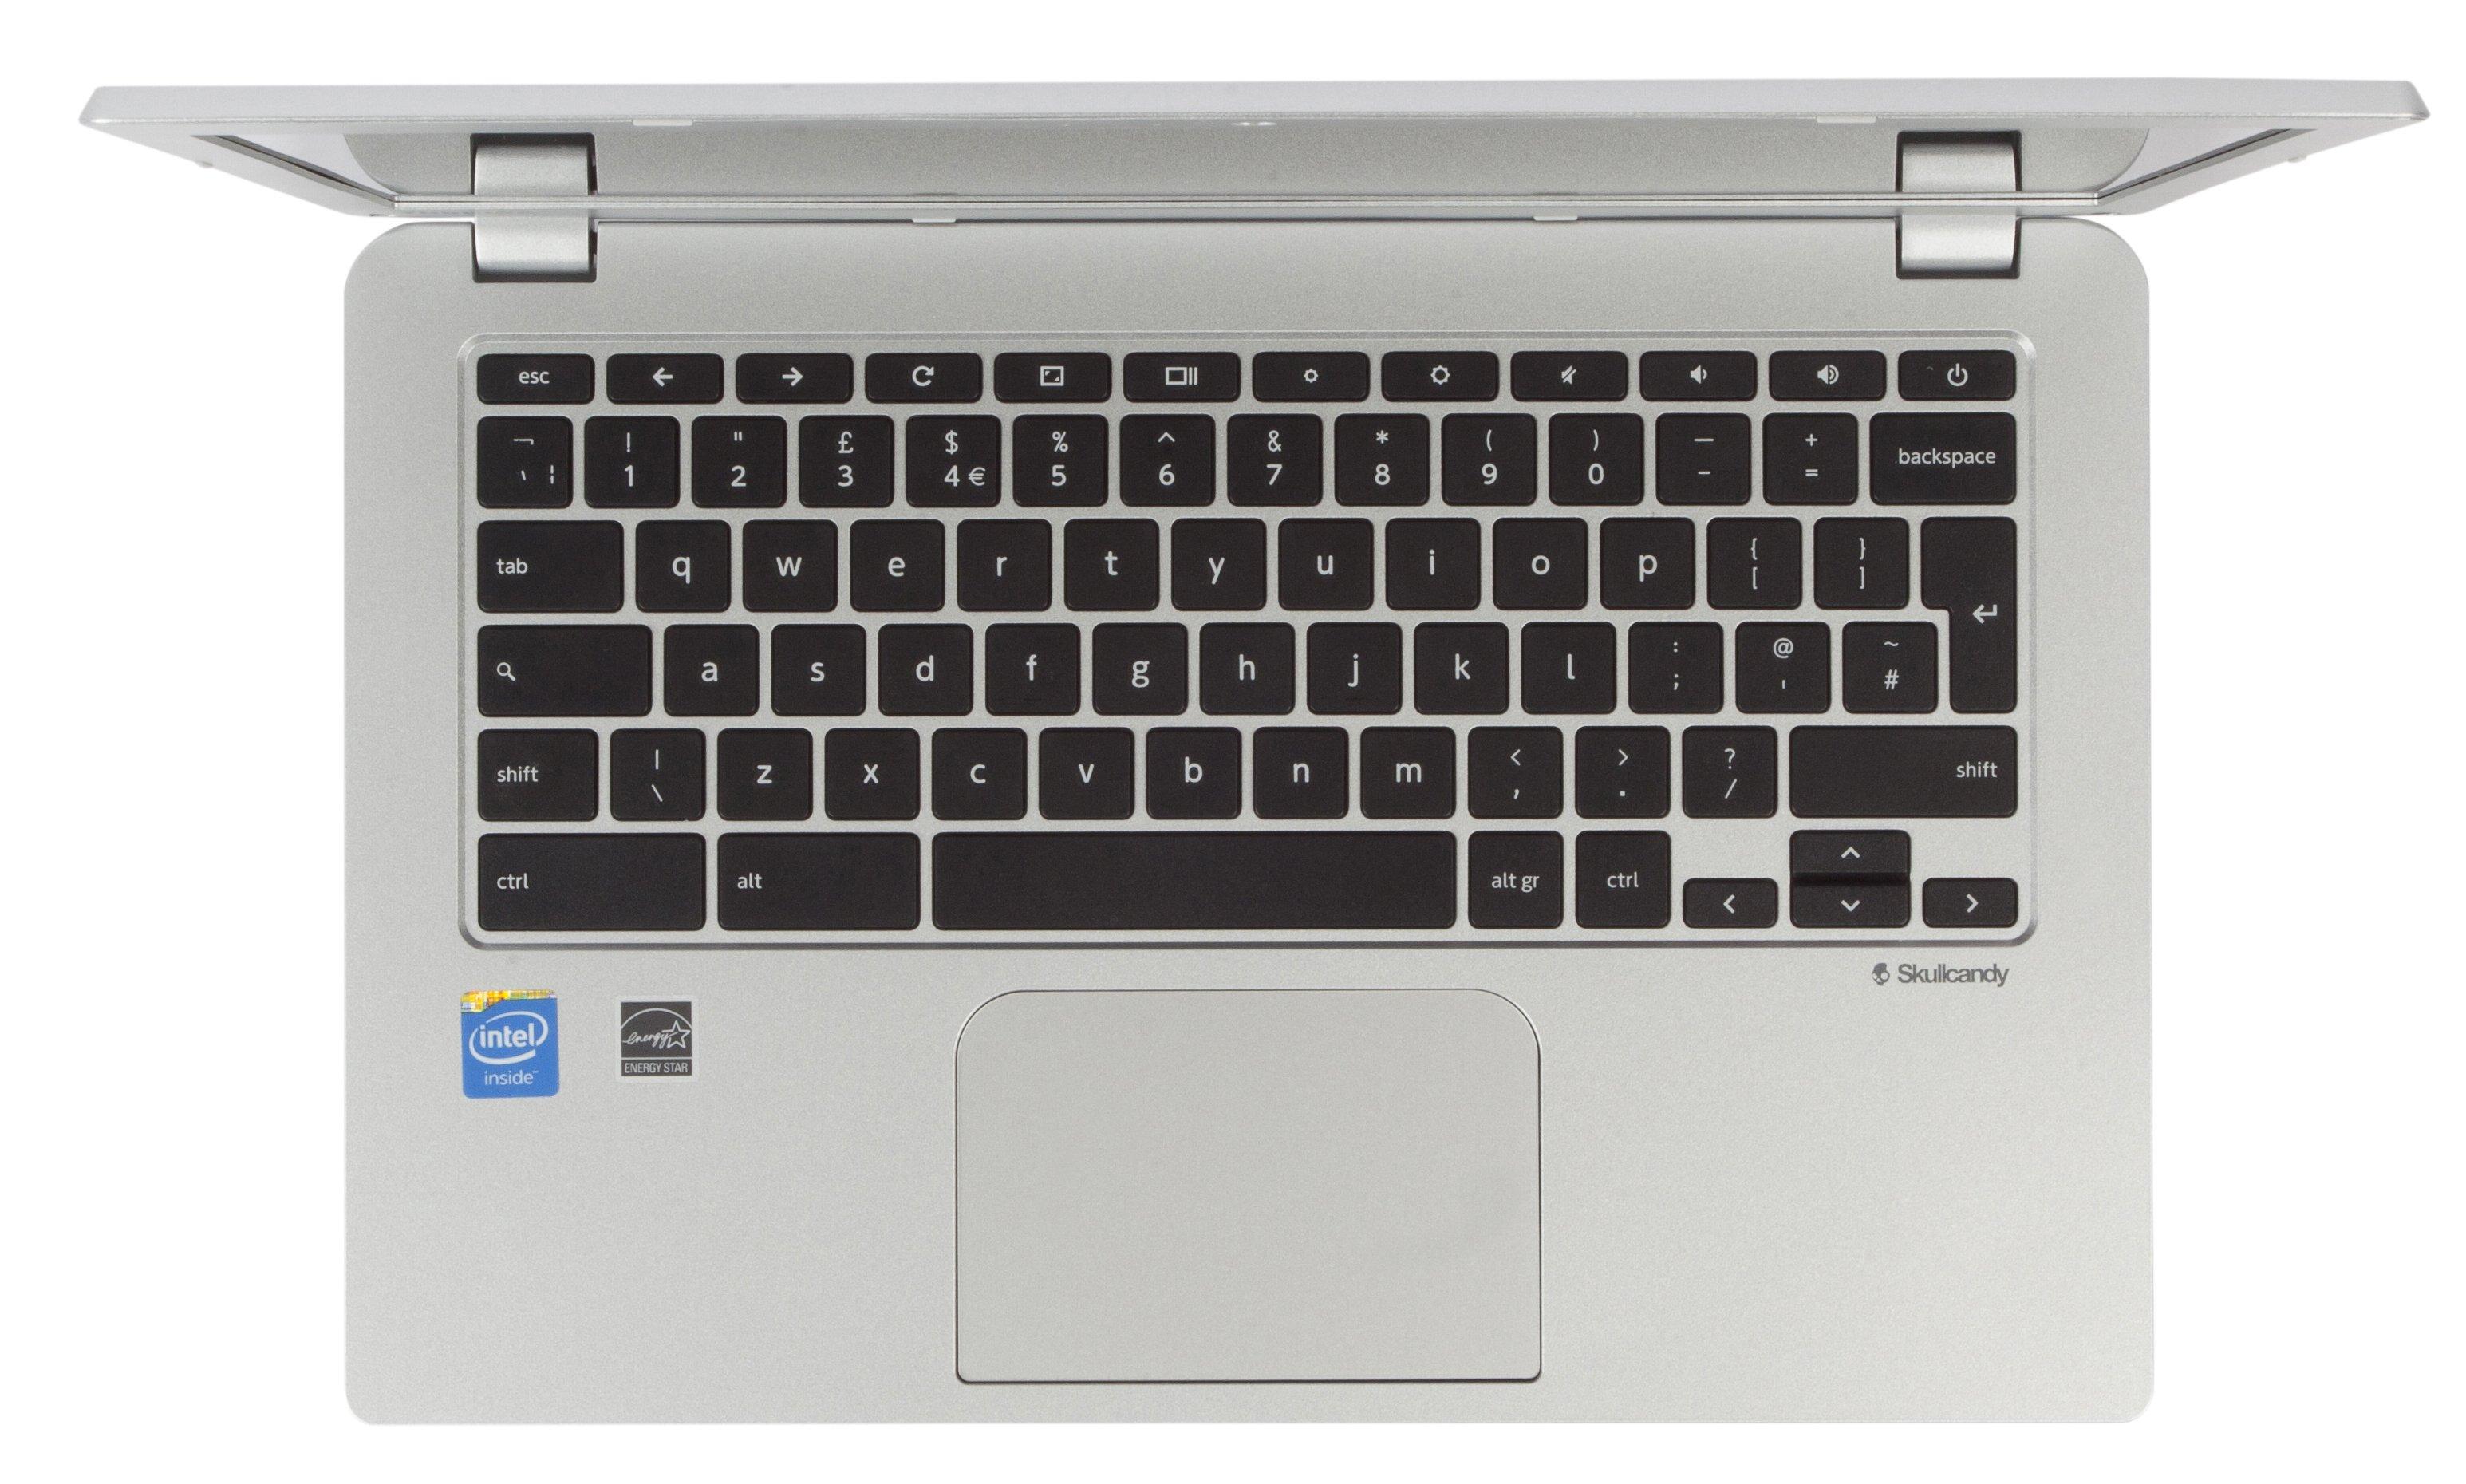 Review Toshiba Chromebook 2 CB35 - lebih baik dibandingkan Chromebook lainnya.